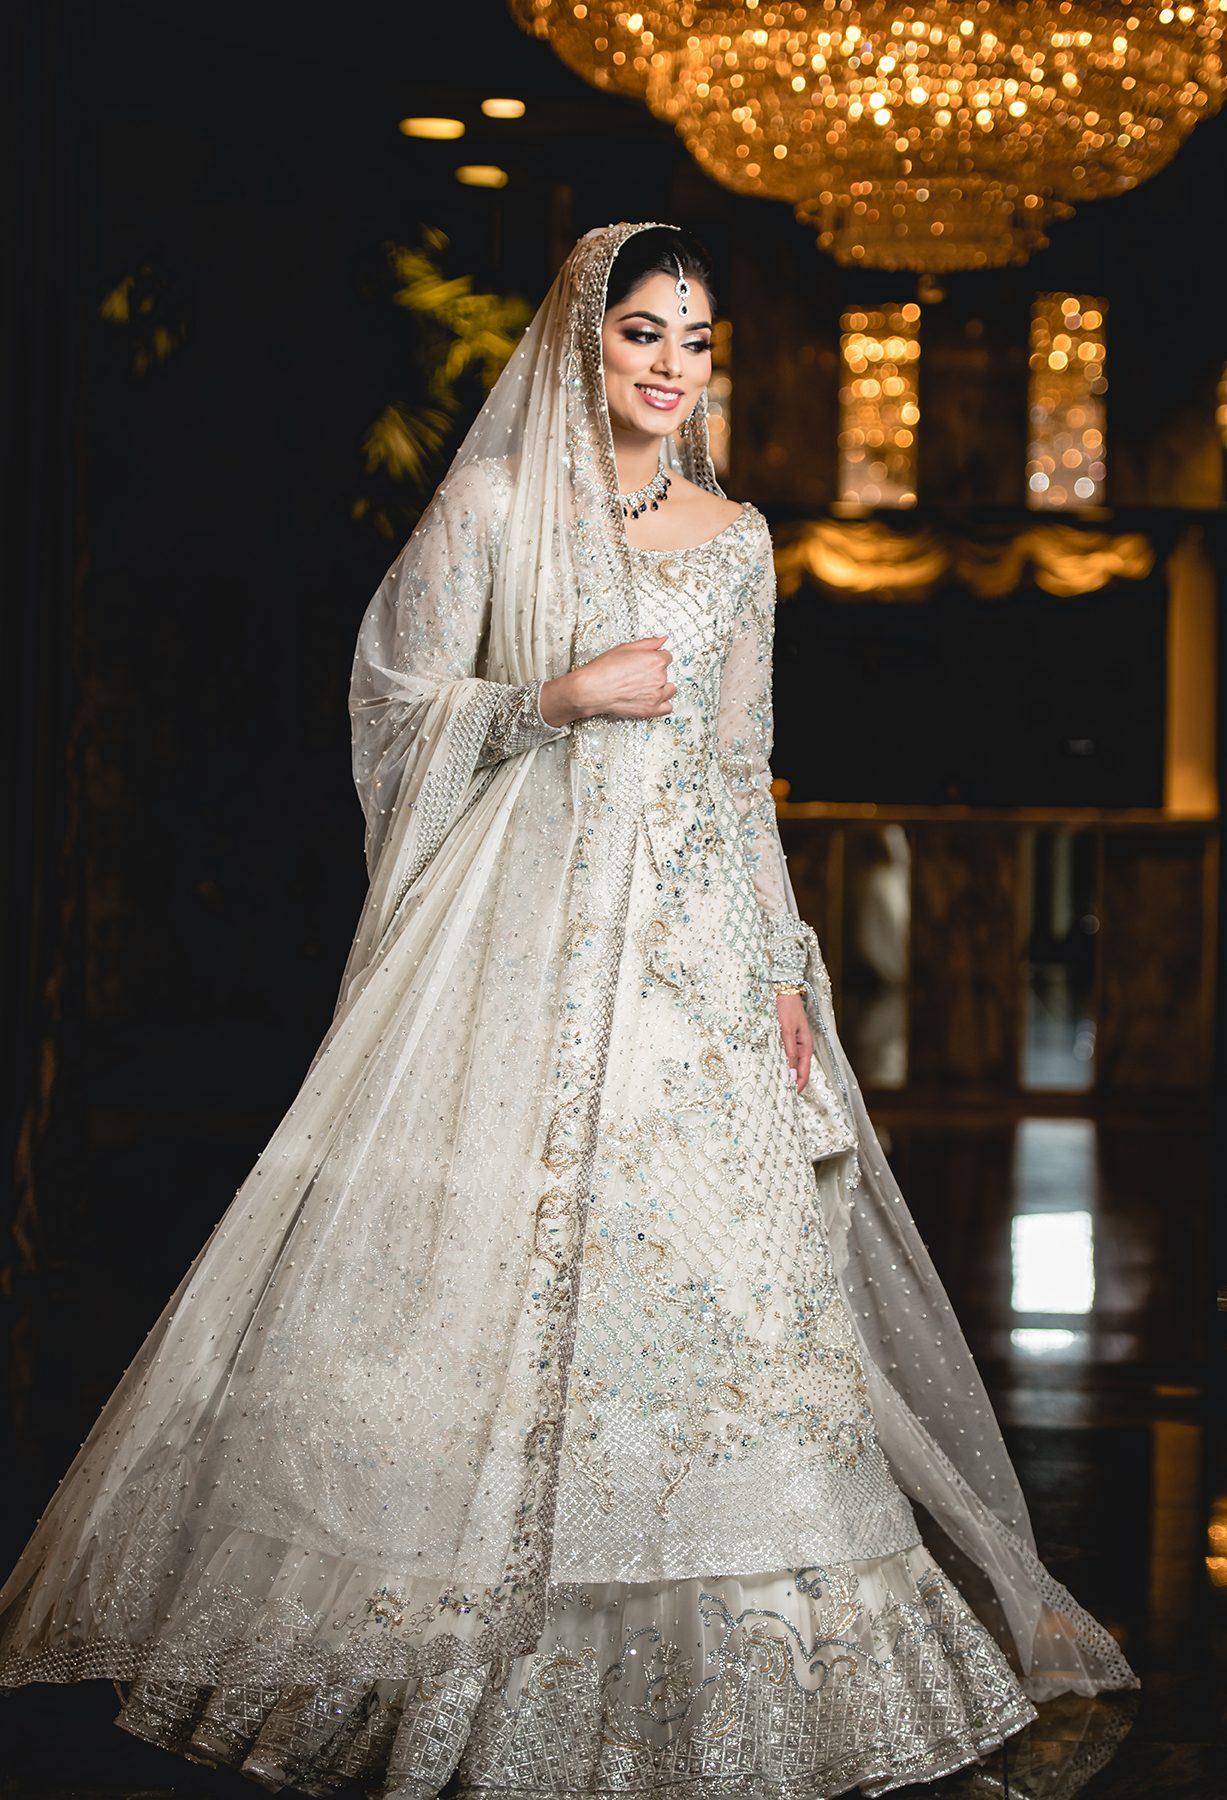 south_asian_wedding_photography_leonards_palazzo_long_island_new_york_dhoom_studio_70-1227x1800 SOUTH ASIAN WEDDINGS